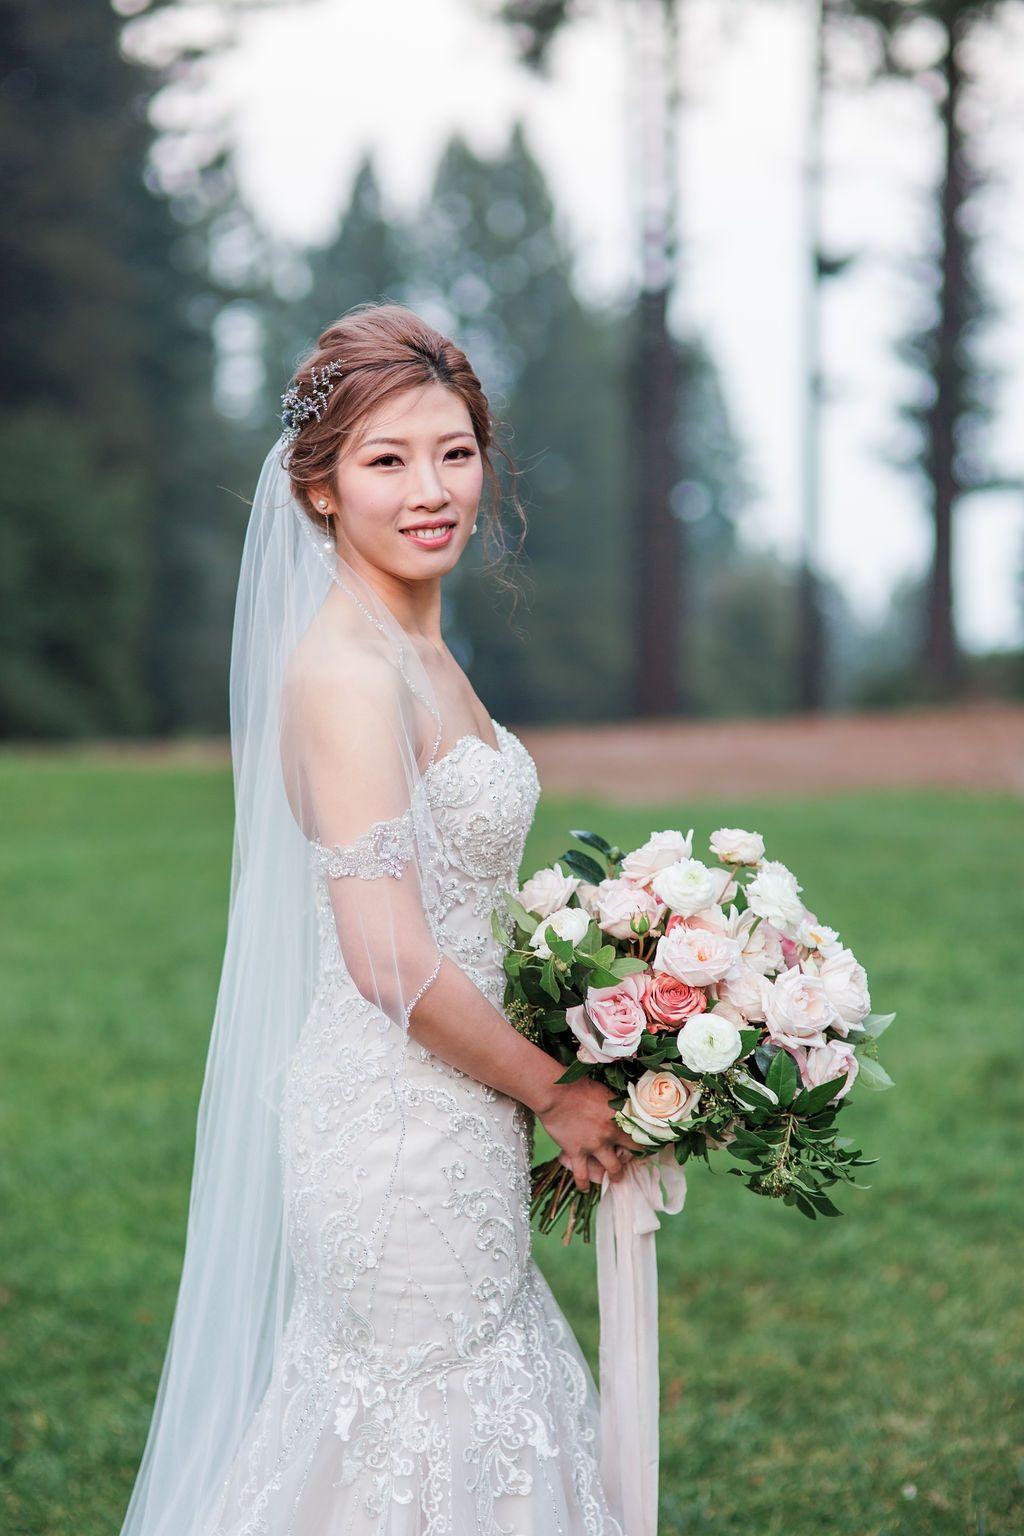 Bride's Portrait at The Mountain Terrace Event Planning